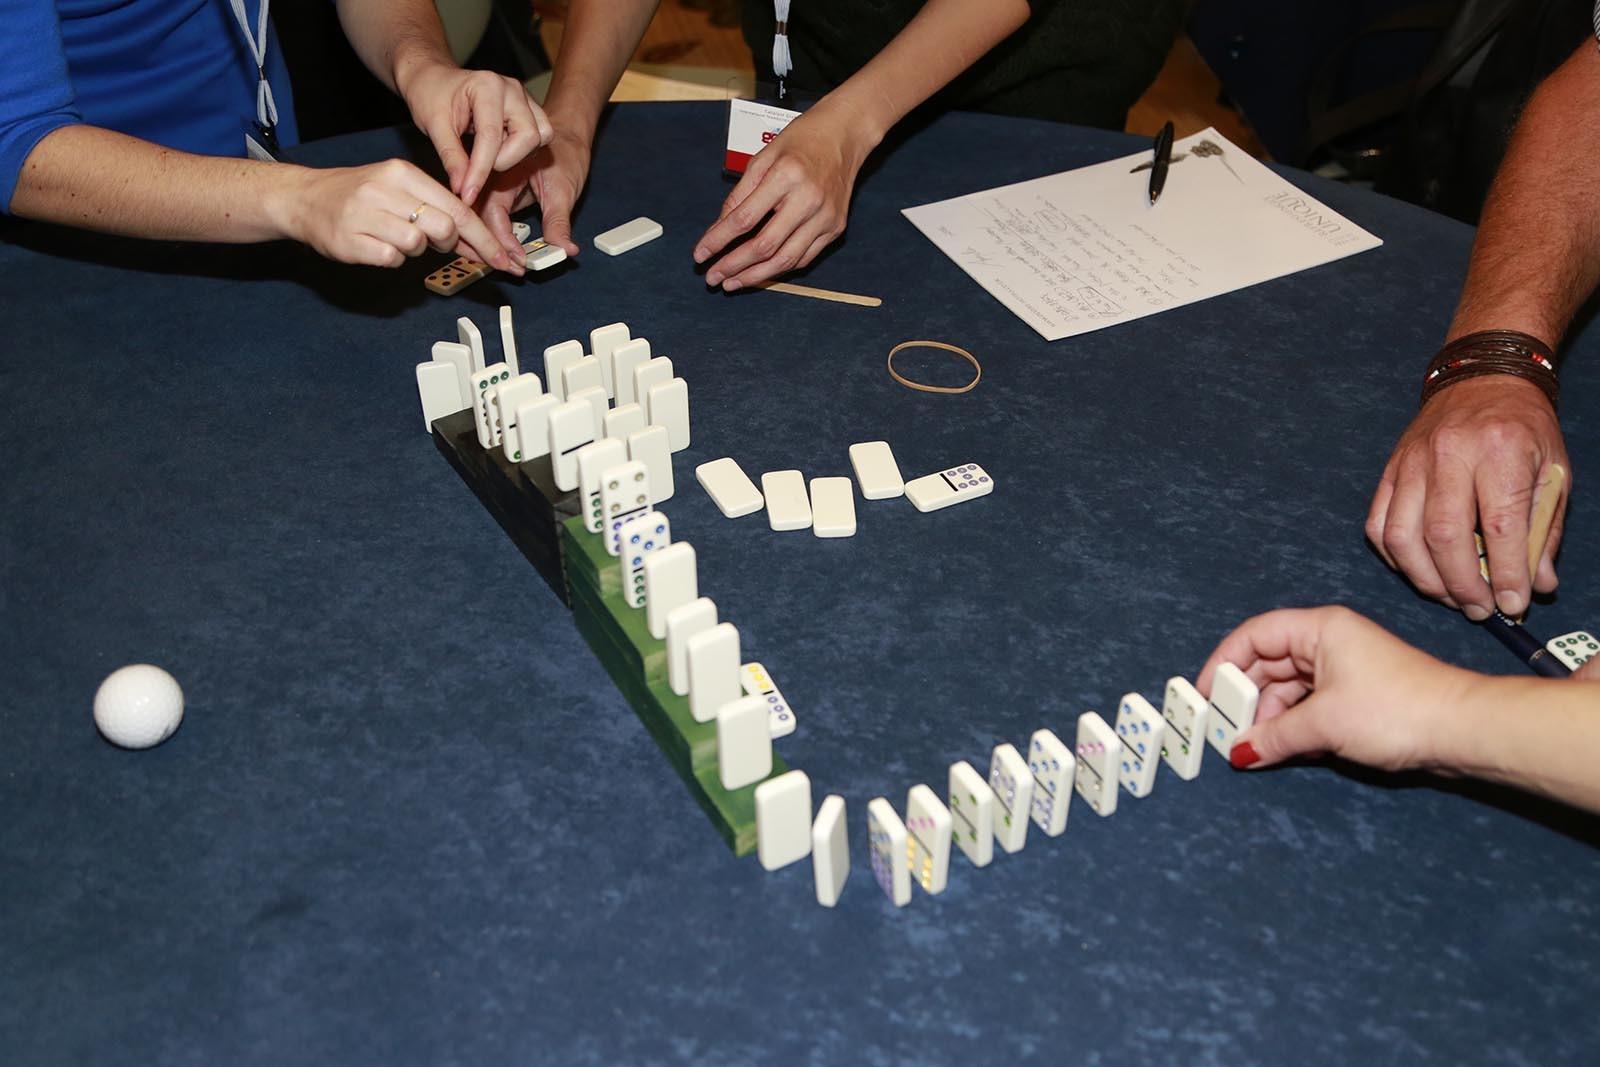 Team si pripravil plan a ted zkousi jeho provedeni ve hre Domino Effect